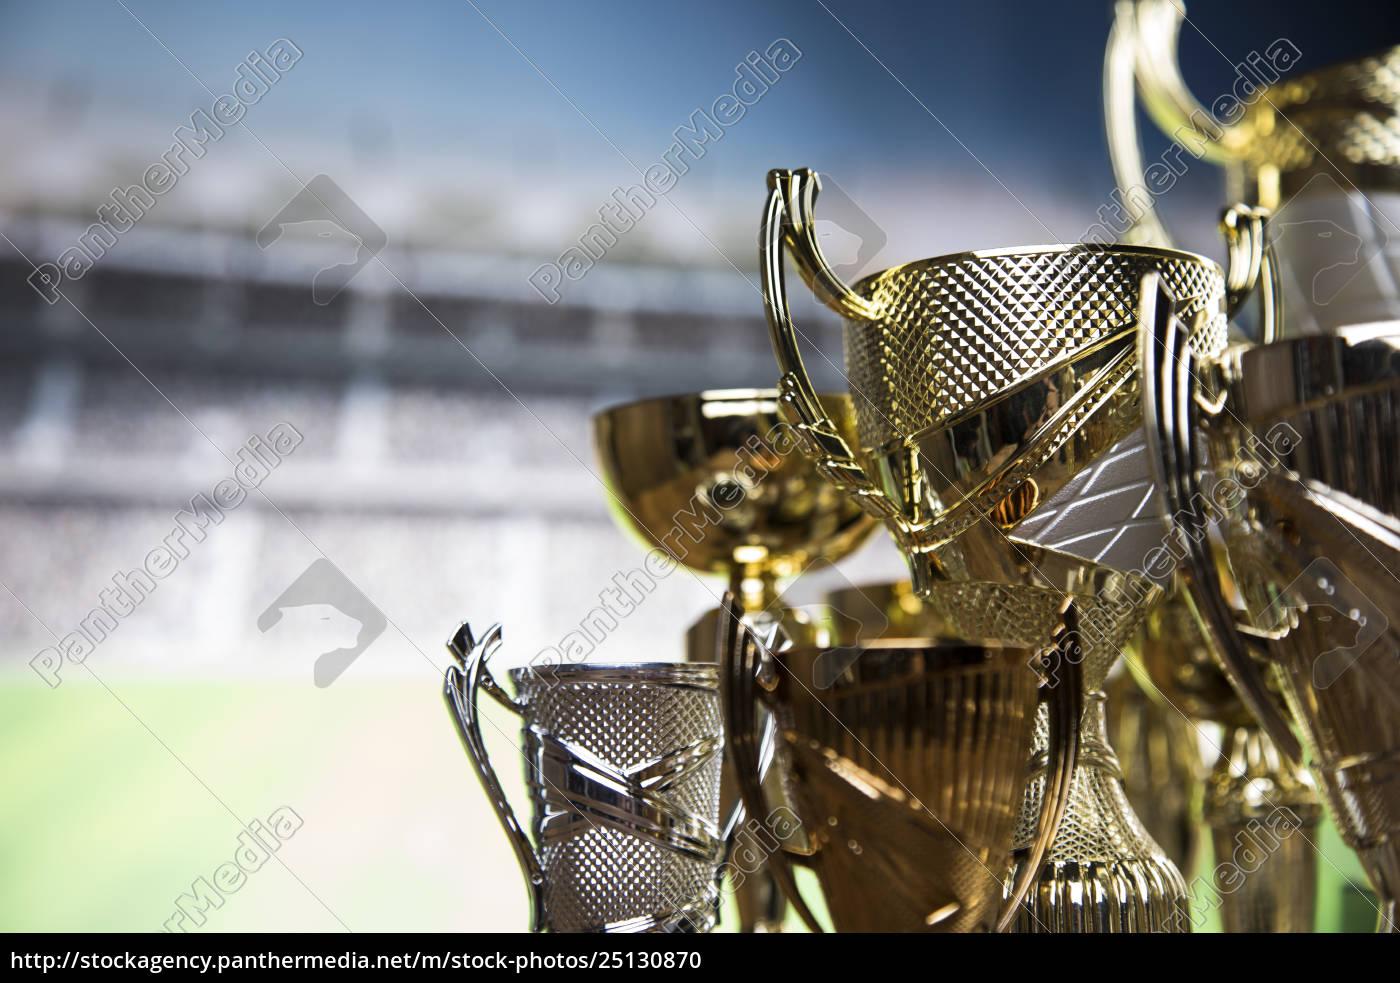 award, winning, trophy, sport, background - 25130870